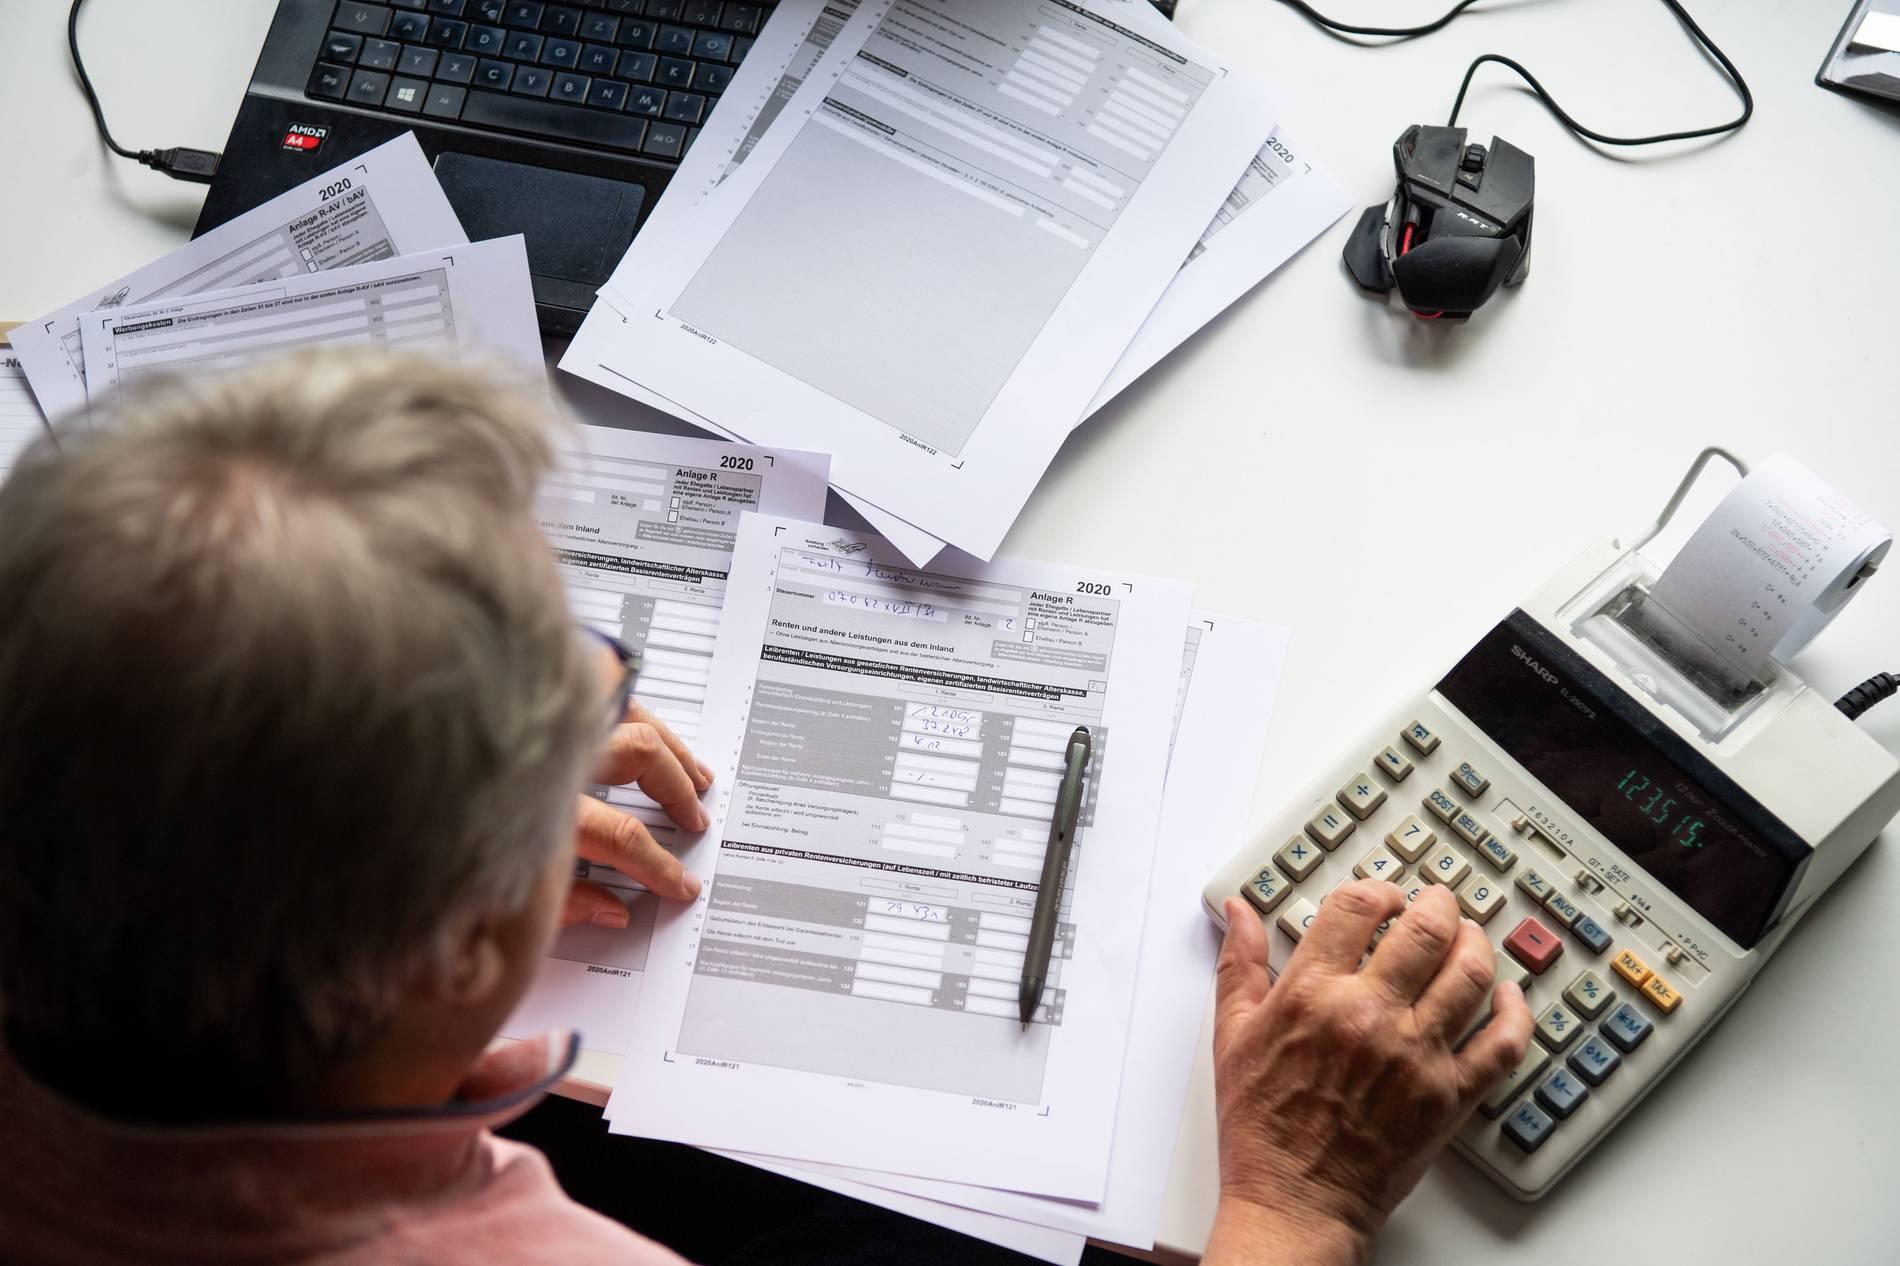 Doppelbesteuerung: Bundesfinanzhof fordert Änderung an Rentenbesteuerung